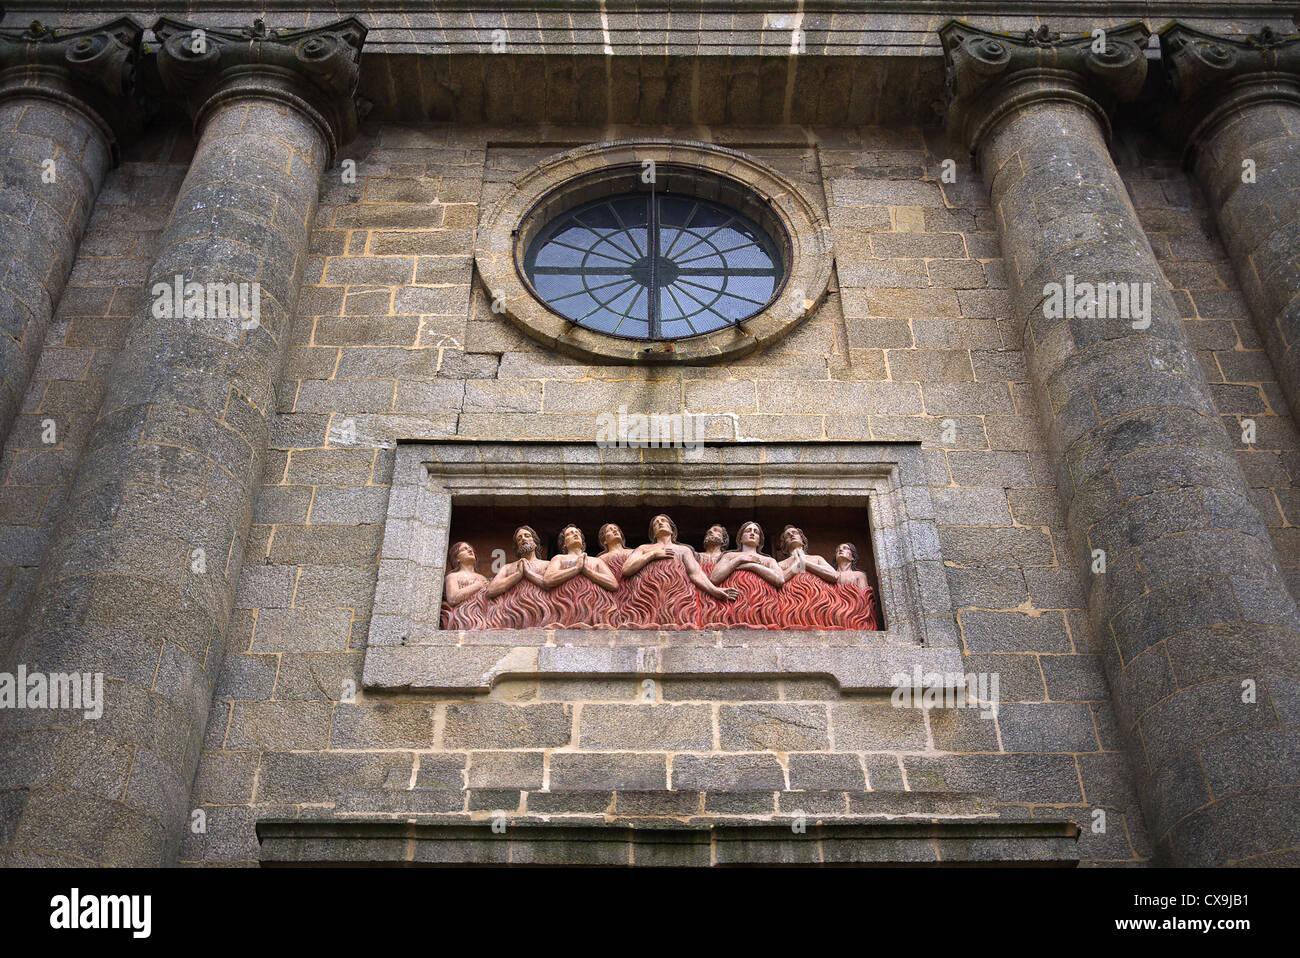 Santiago de Compostela, Spain. - Stock Image